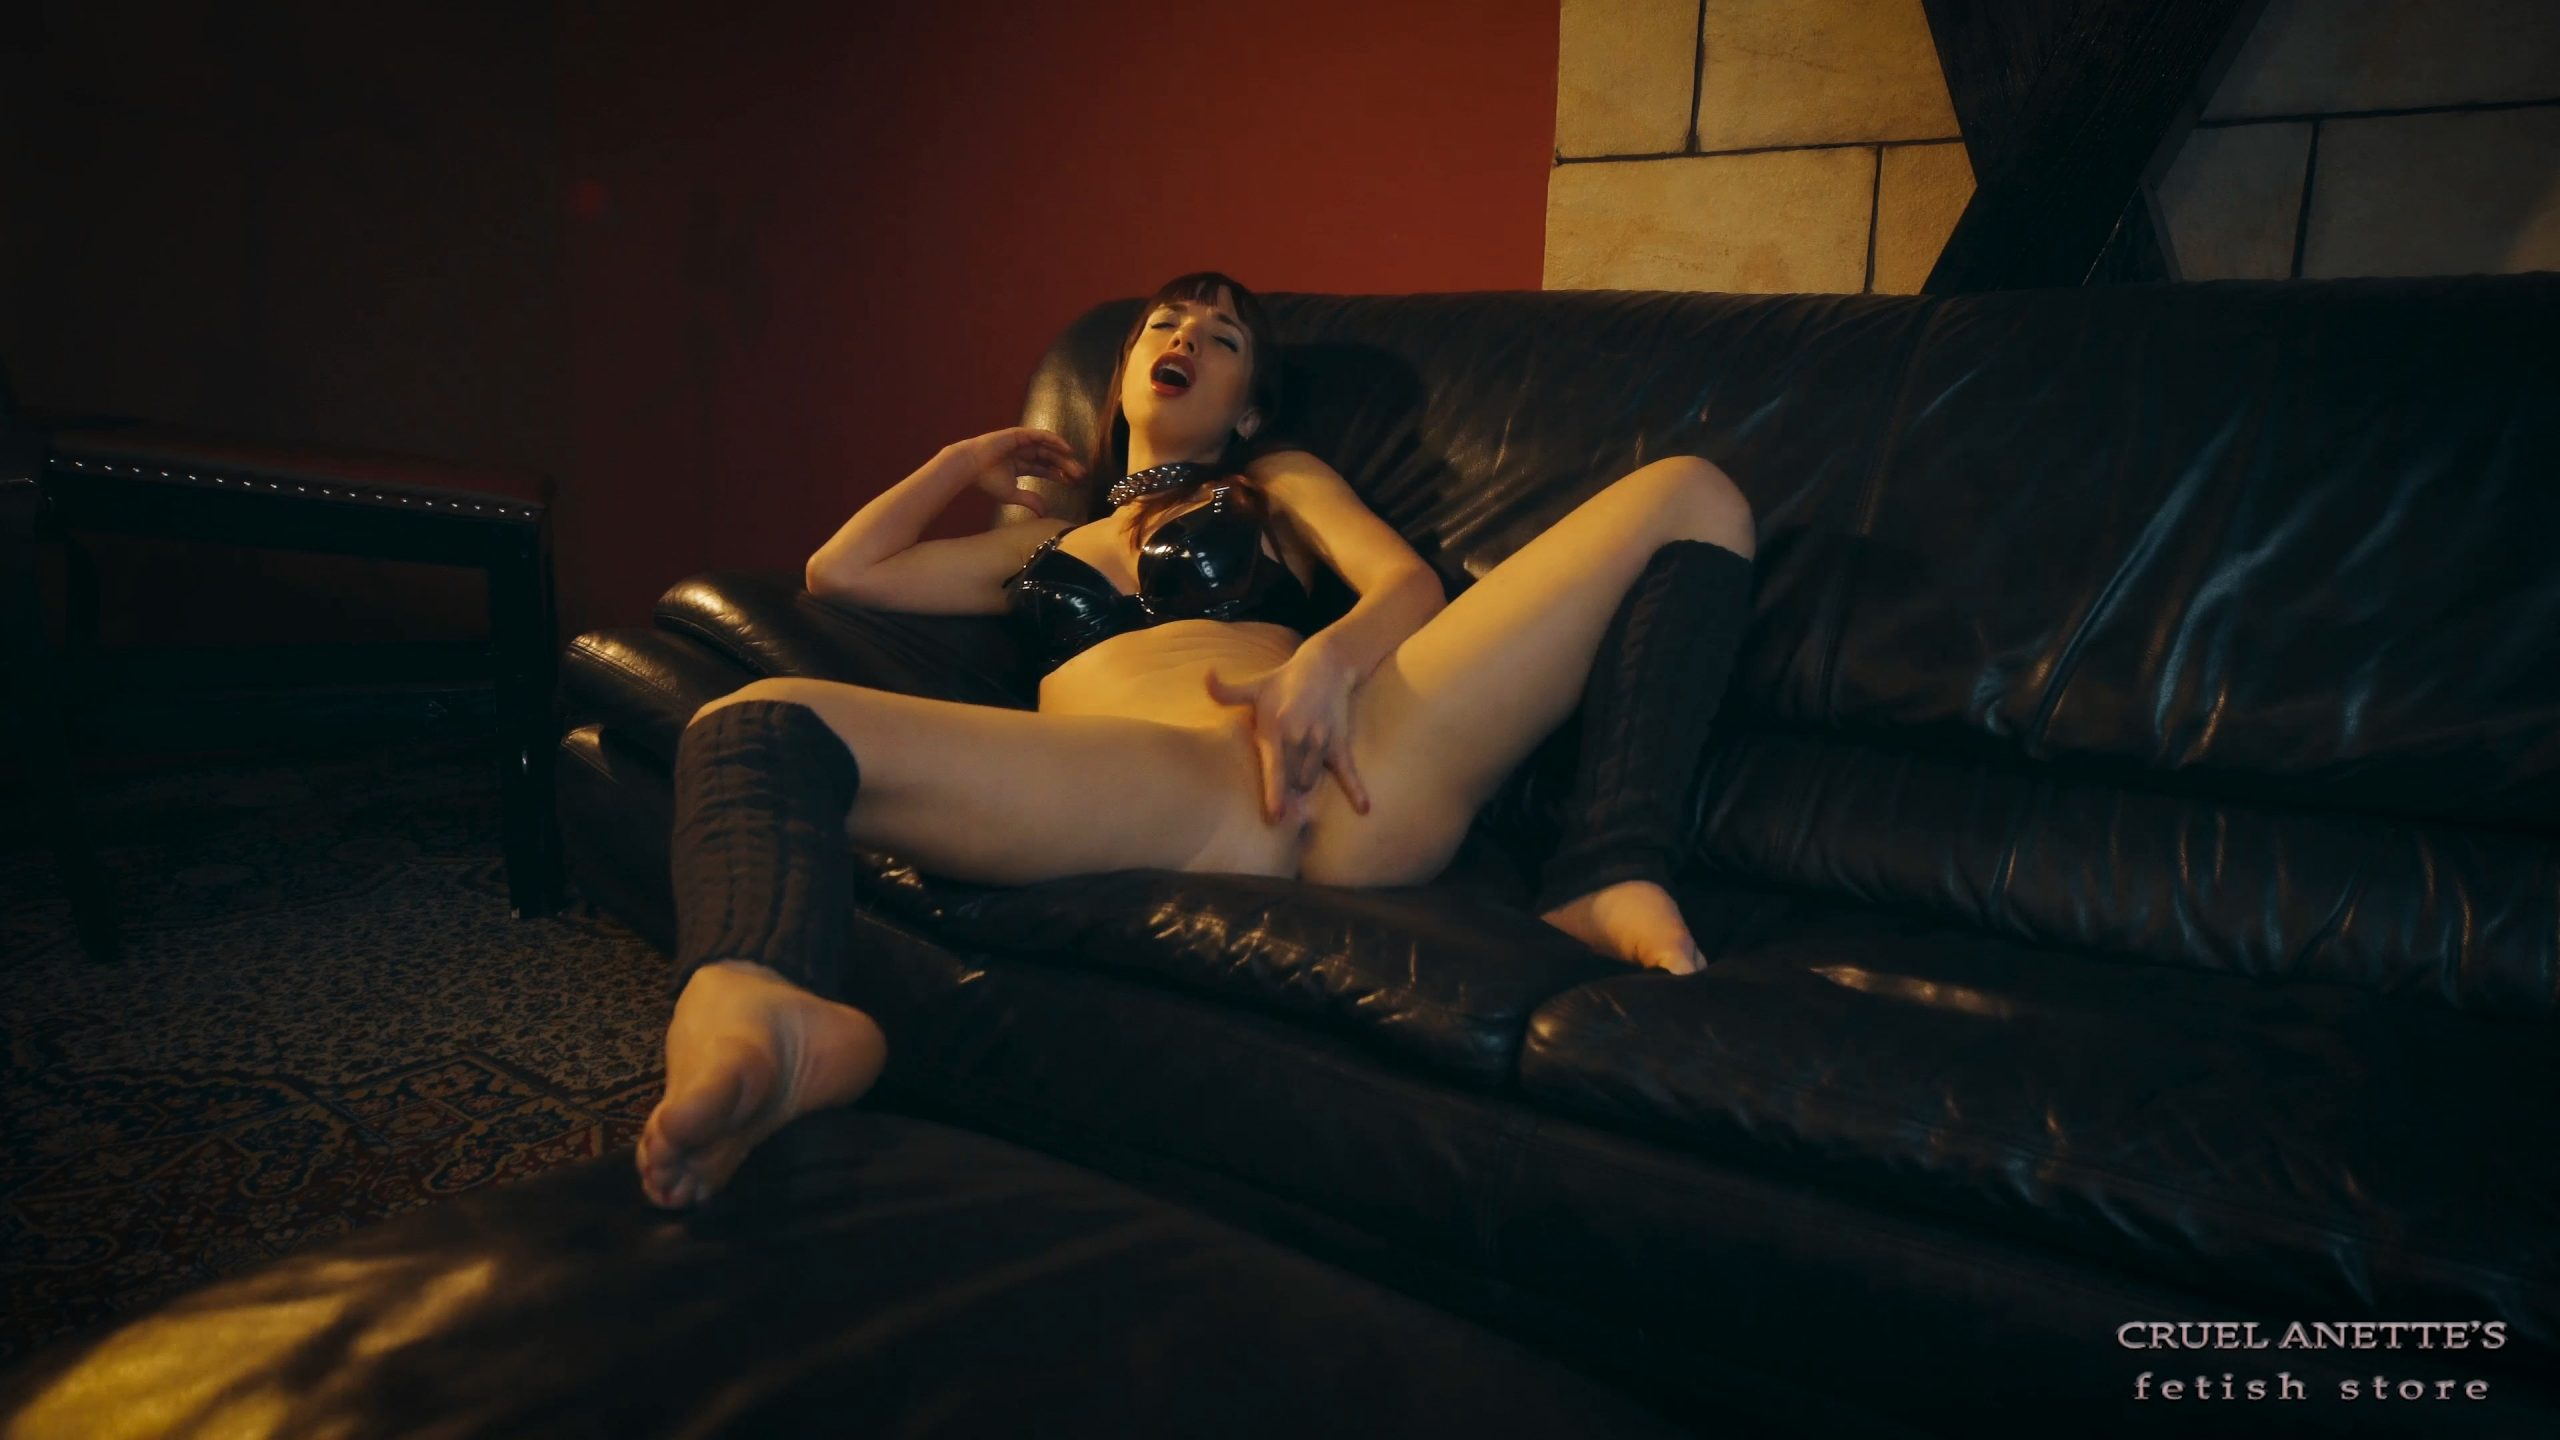 Moaning Nina - CRUEL ANETTES FETISH STORE - FULL HD/2160p/MP4